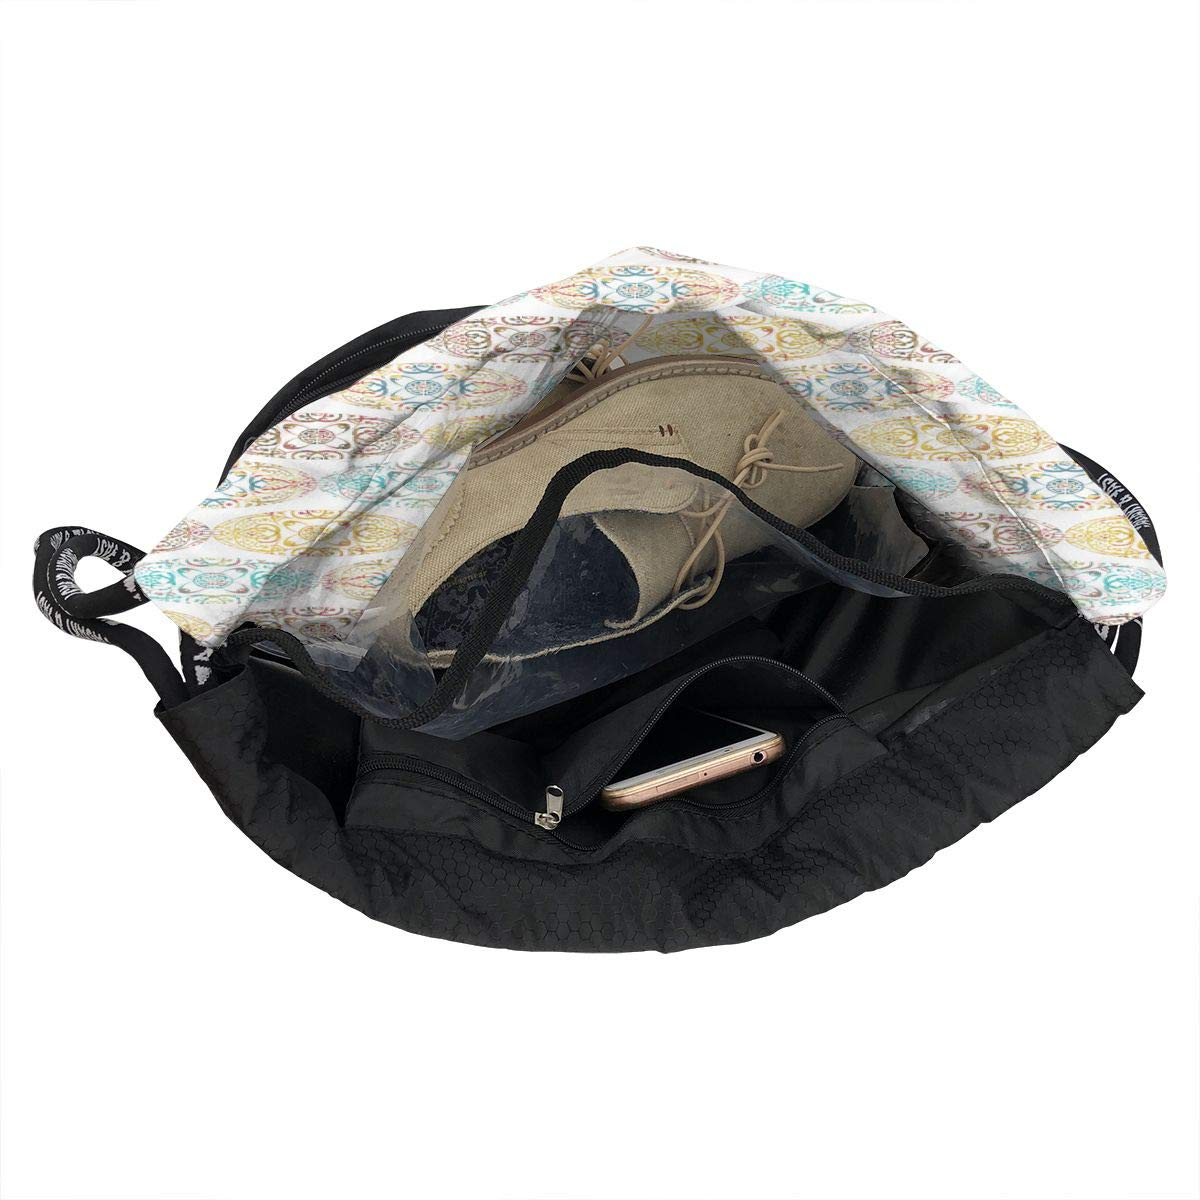 Sprudla All Ellipse Mix Drawstring Backpack Sports Athletic Gym Cinch Sack String Storage Bags for Hiking Travel Beach